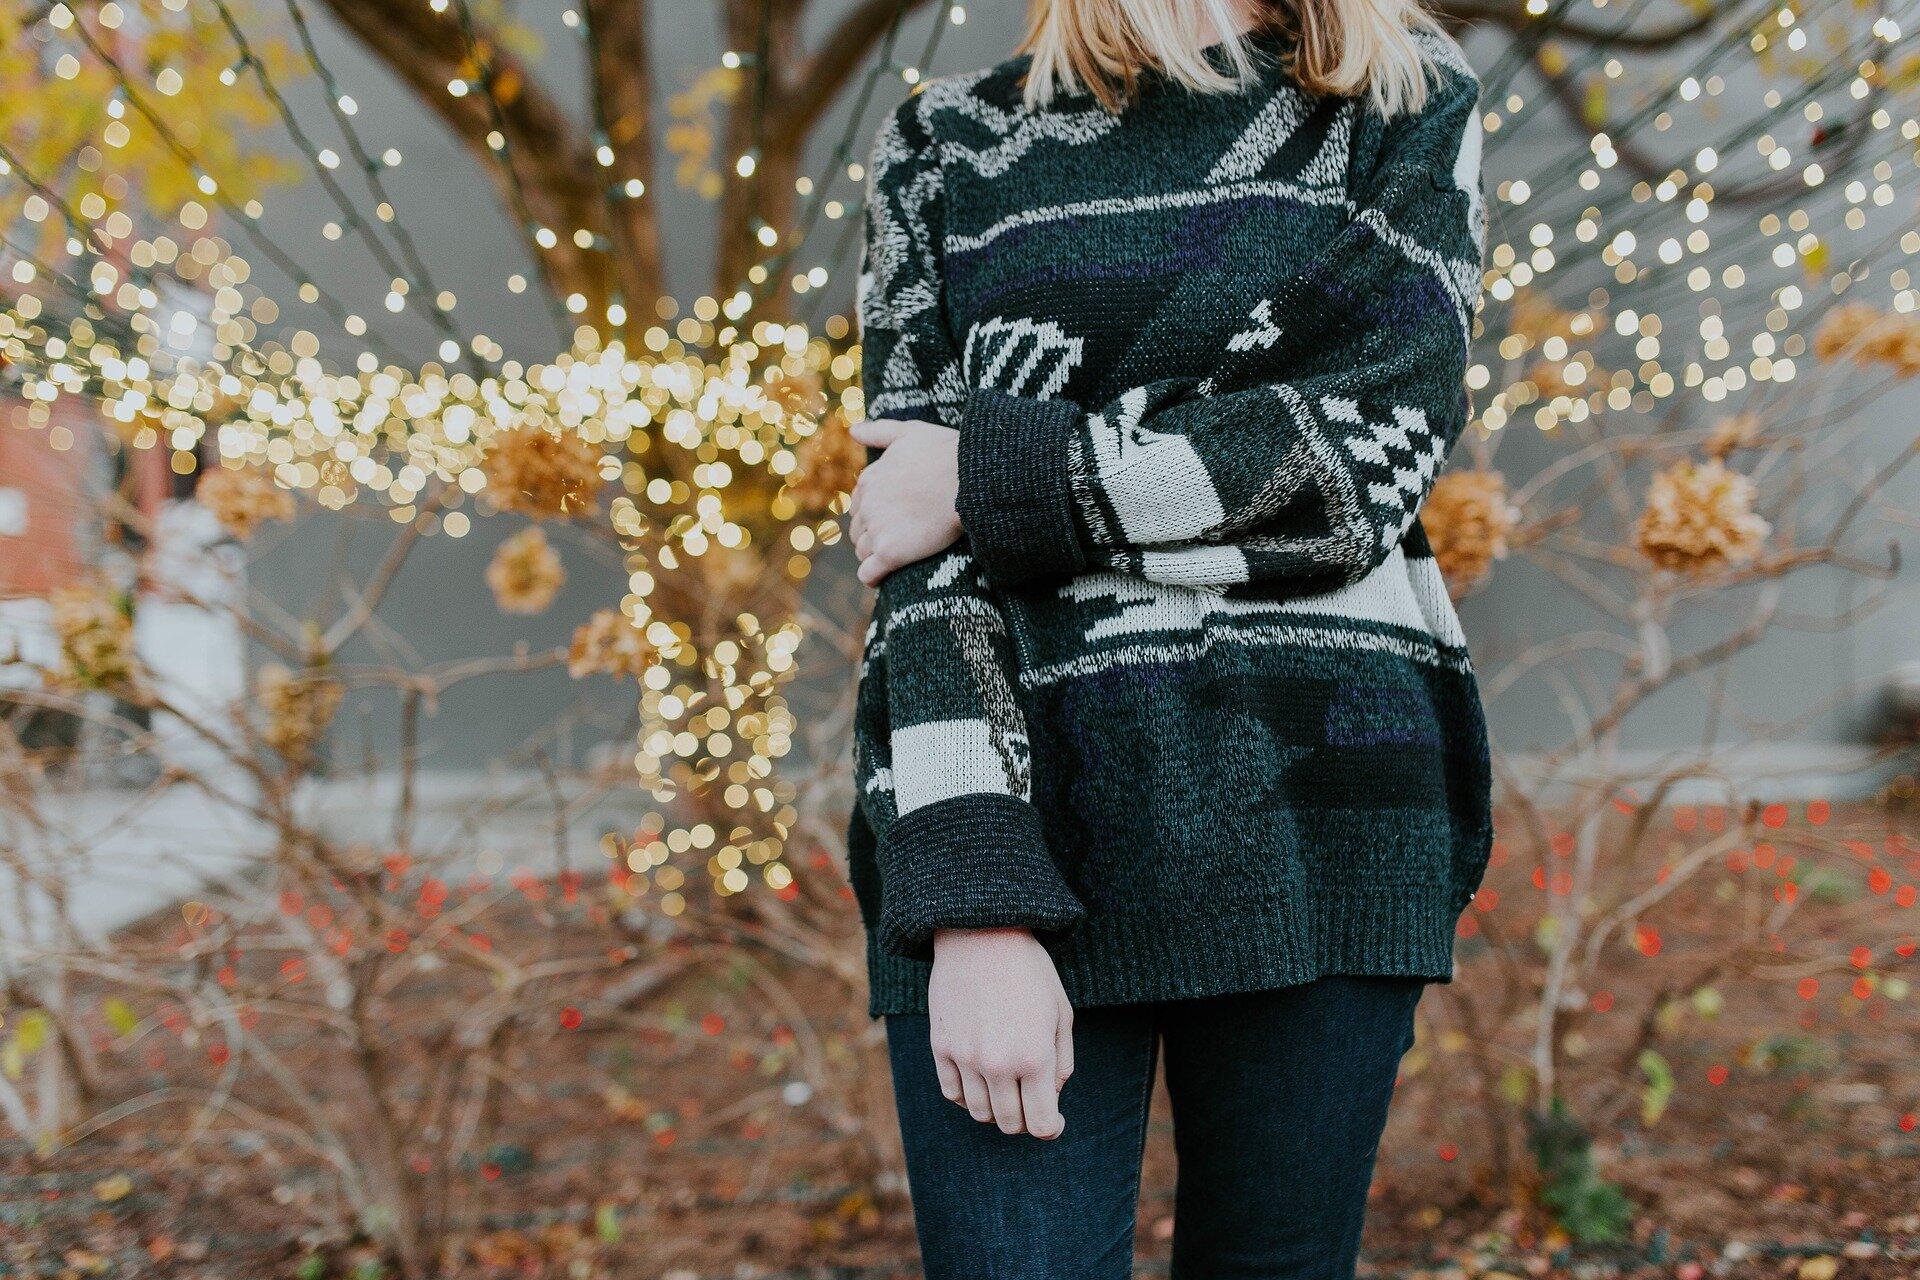 https://pixabay.com/photos/people-woman-sweater-cold-2592330/